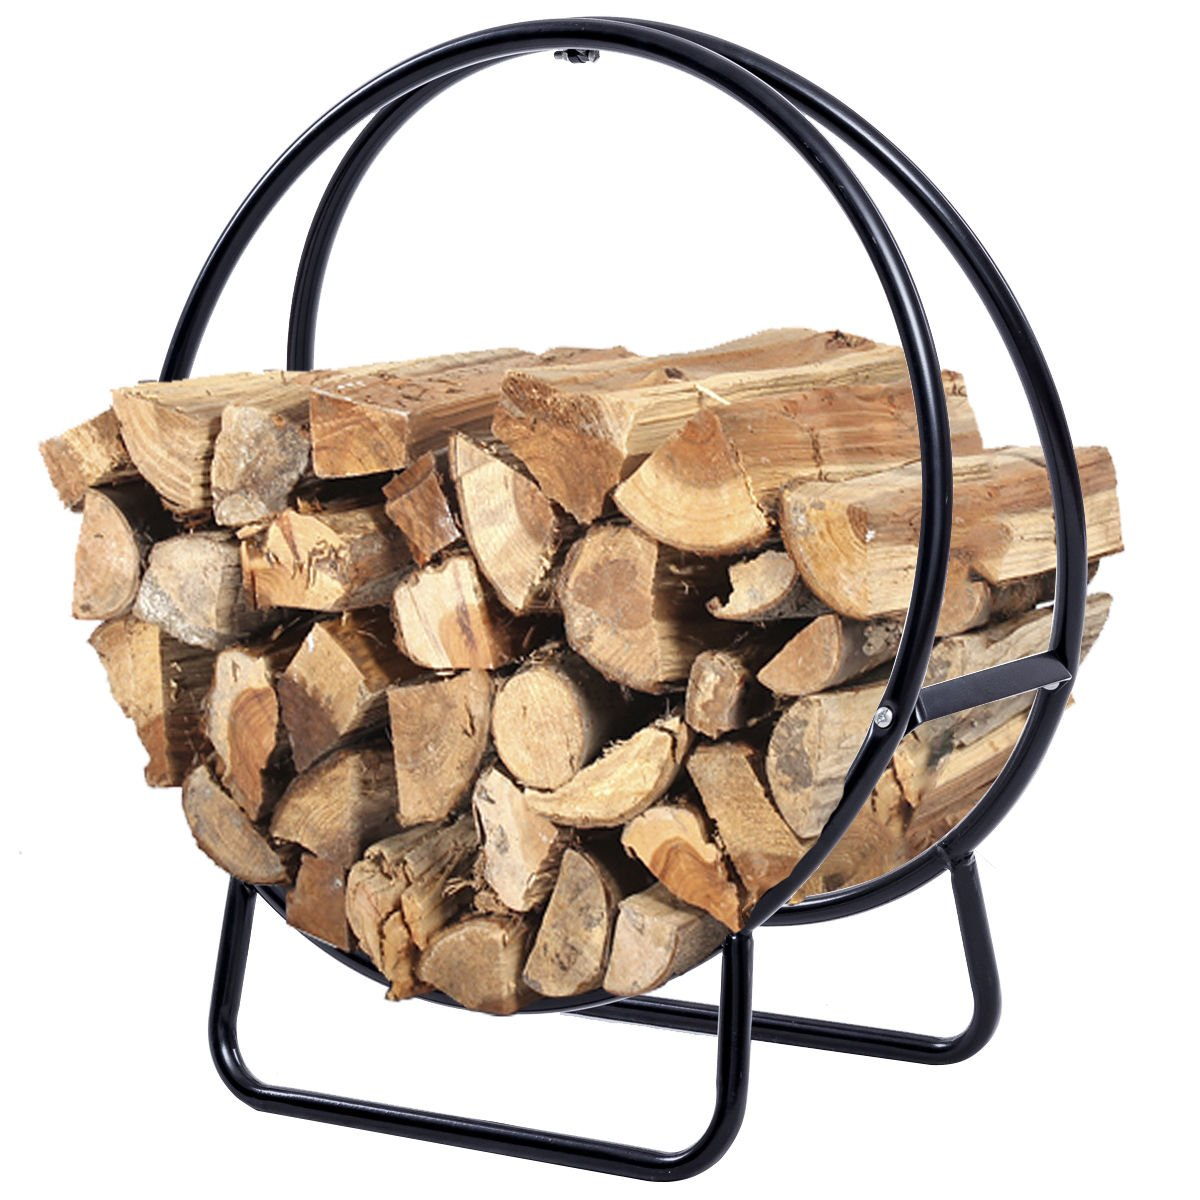 Edxtech 2 Feet Tubular Steel Log Hoop Firewood Storage Rack Holder Round Display